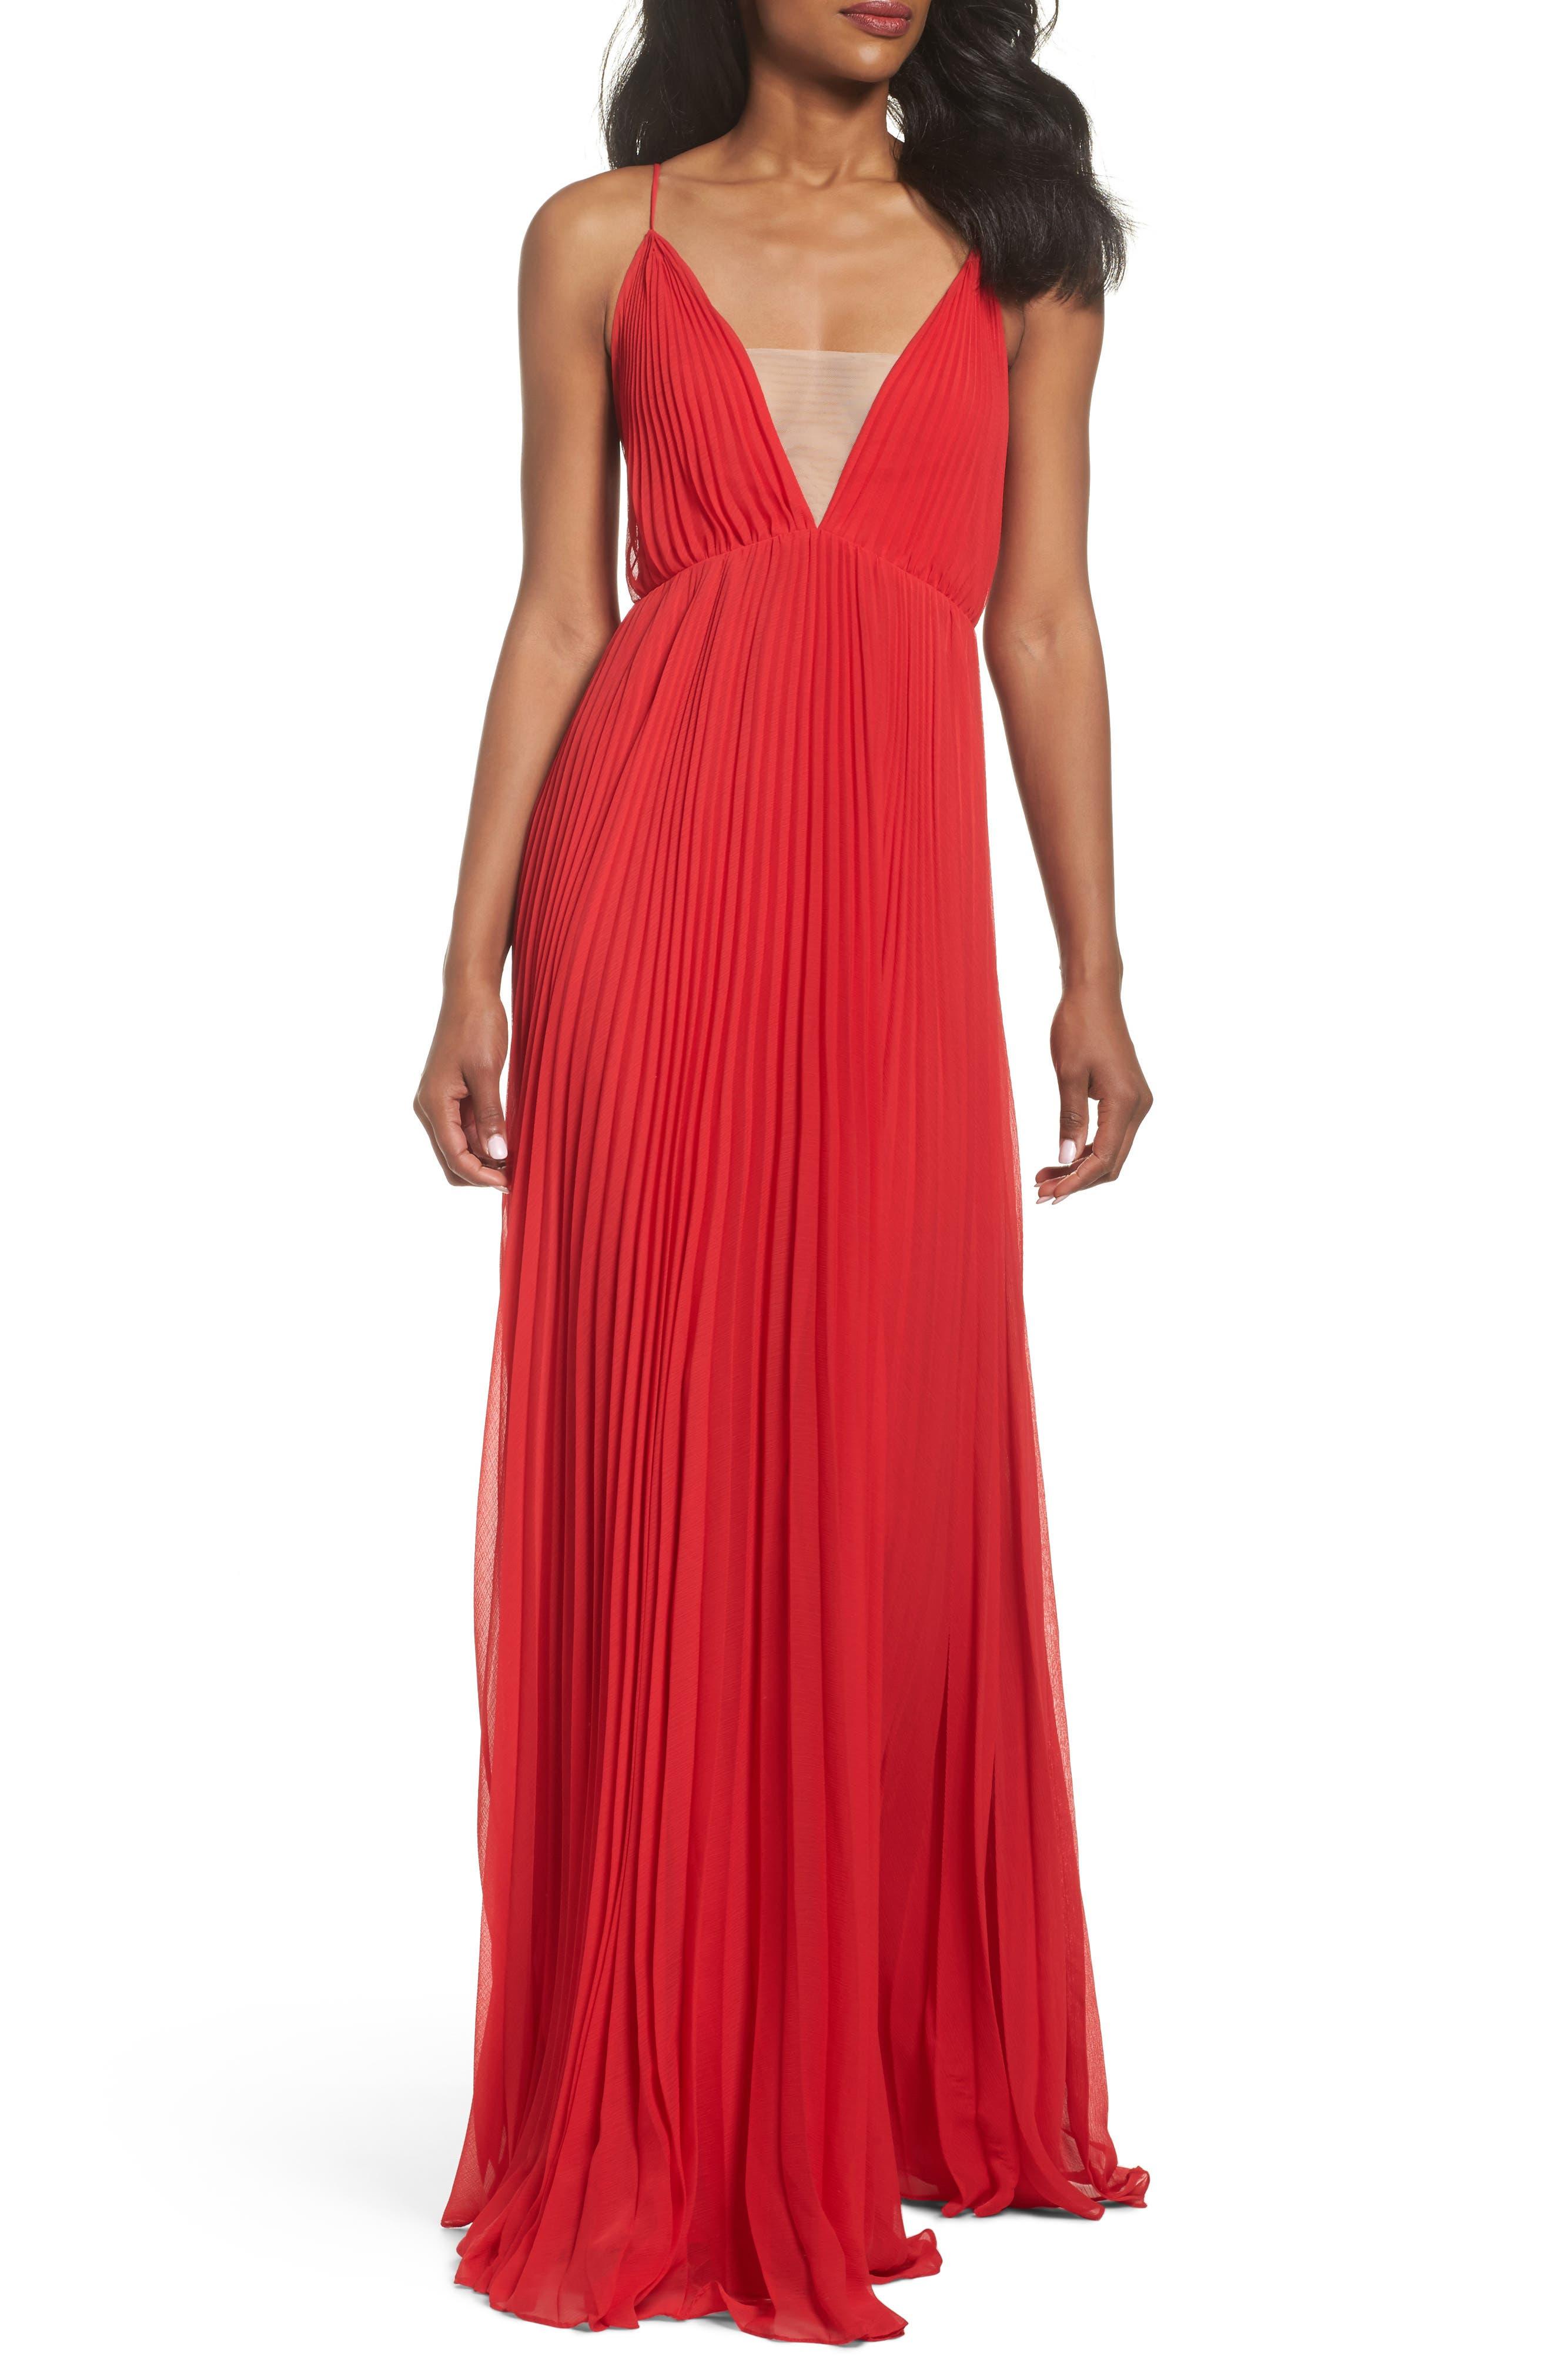 Jill Jill Stuart Pleated Empire Waist Gown